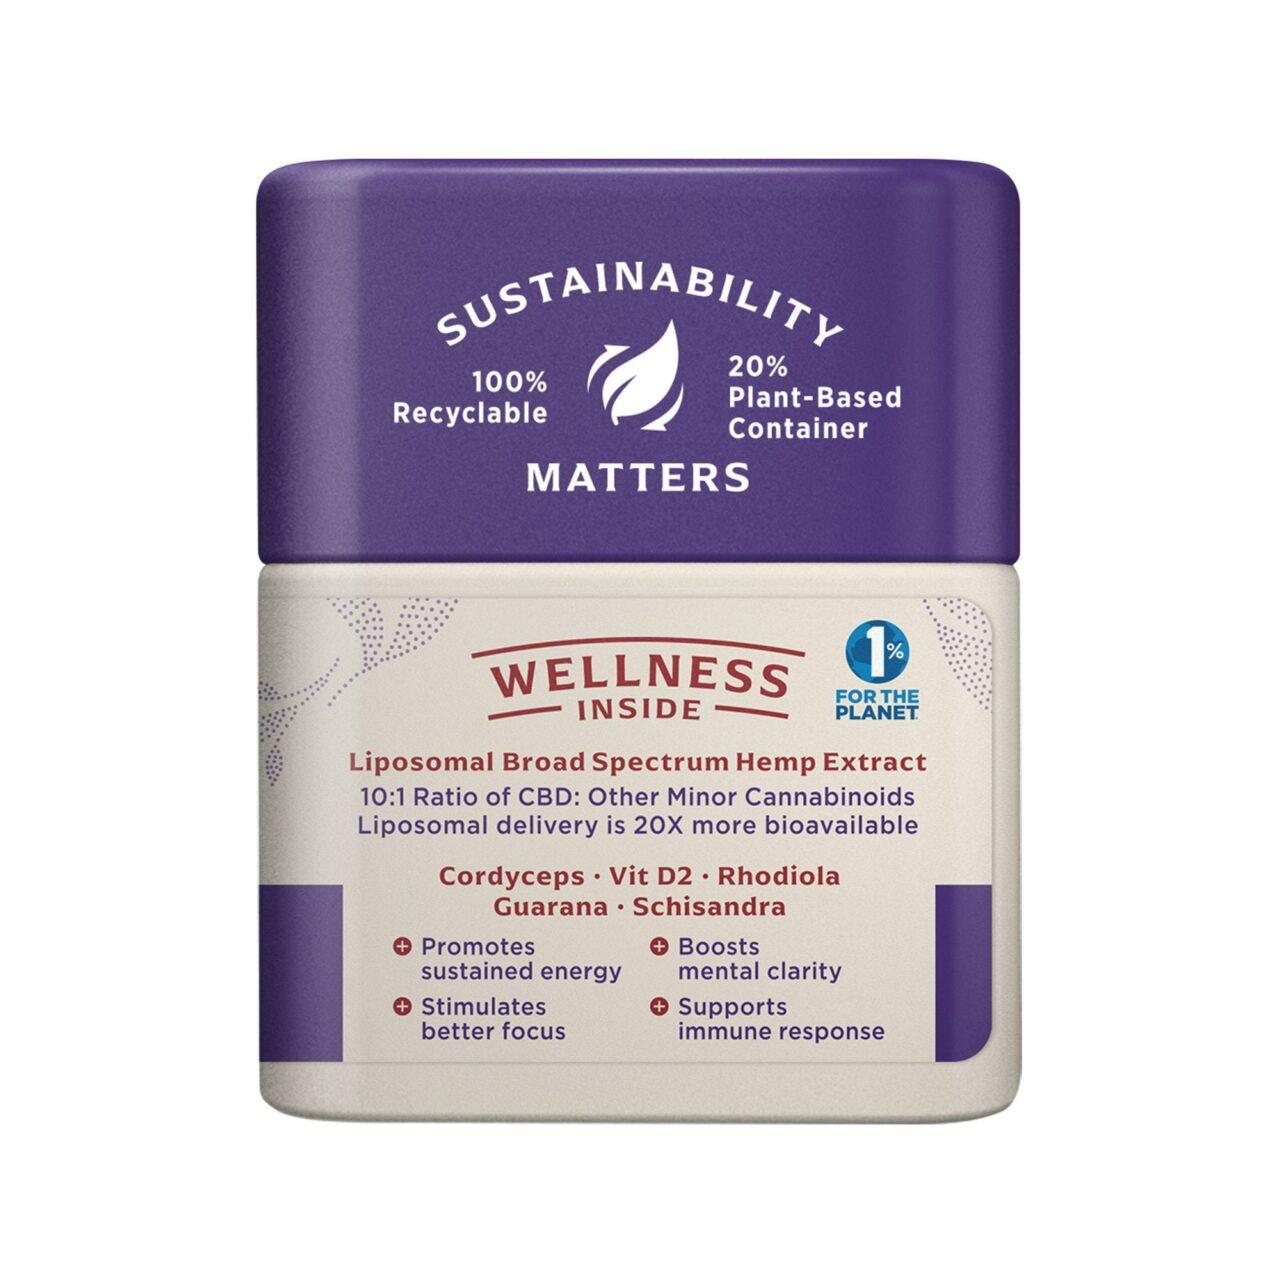 Medterra, Wellness CBD Capsules, Energy, Broad Spectrum THC-Free, 30ct, 750mg CBD 2